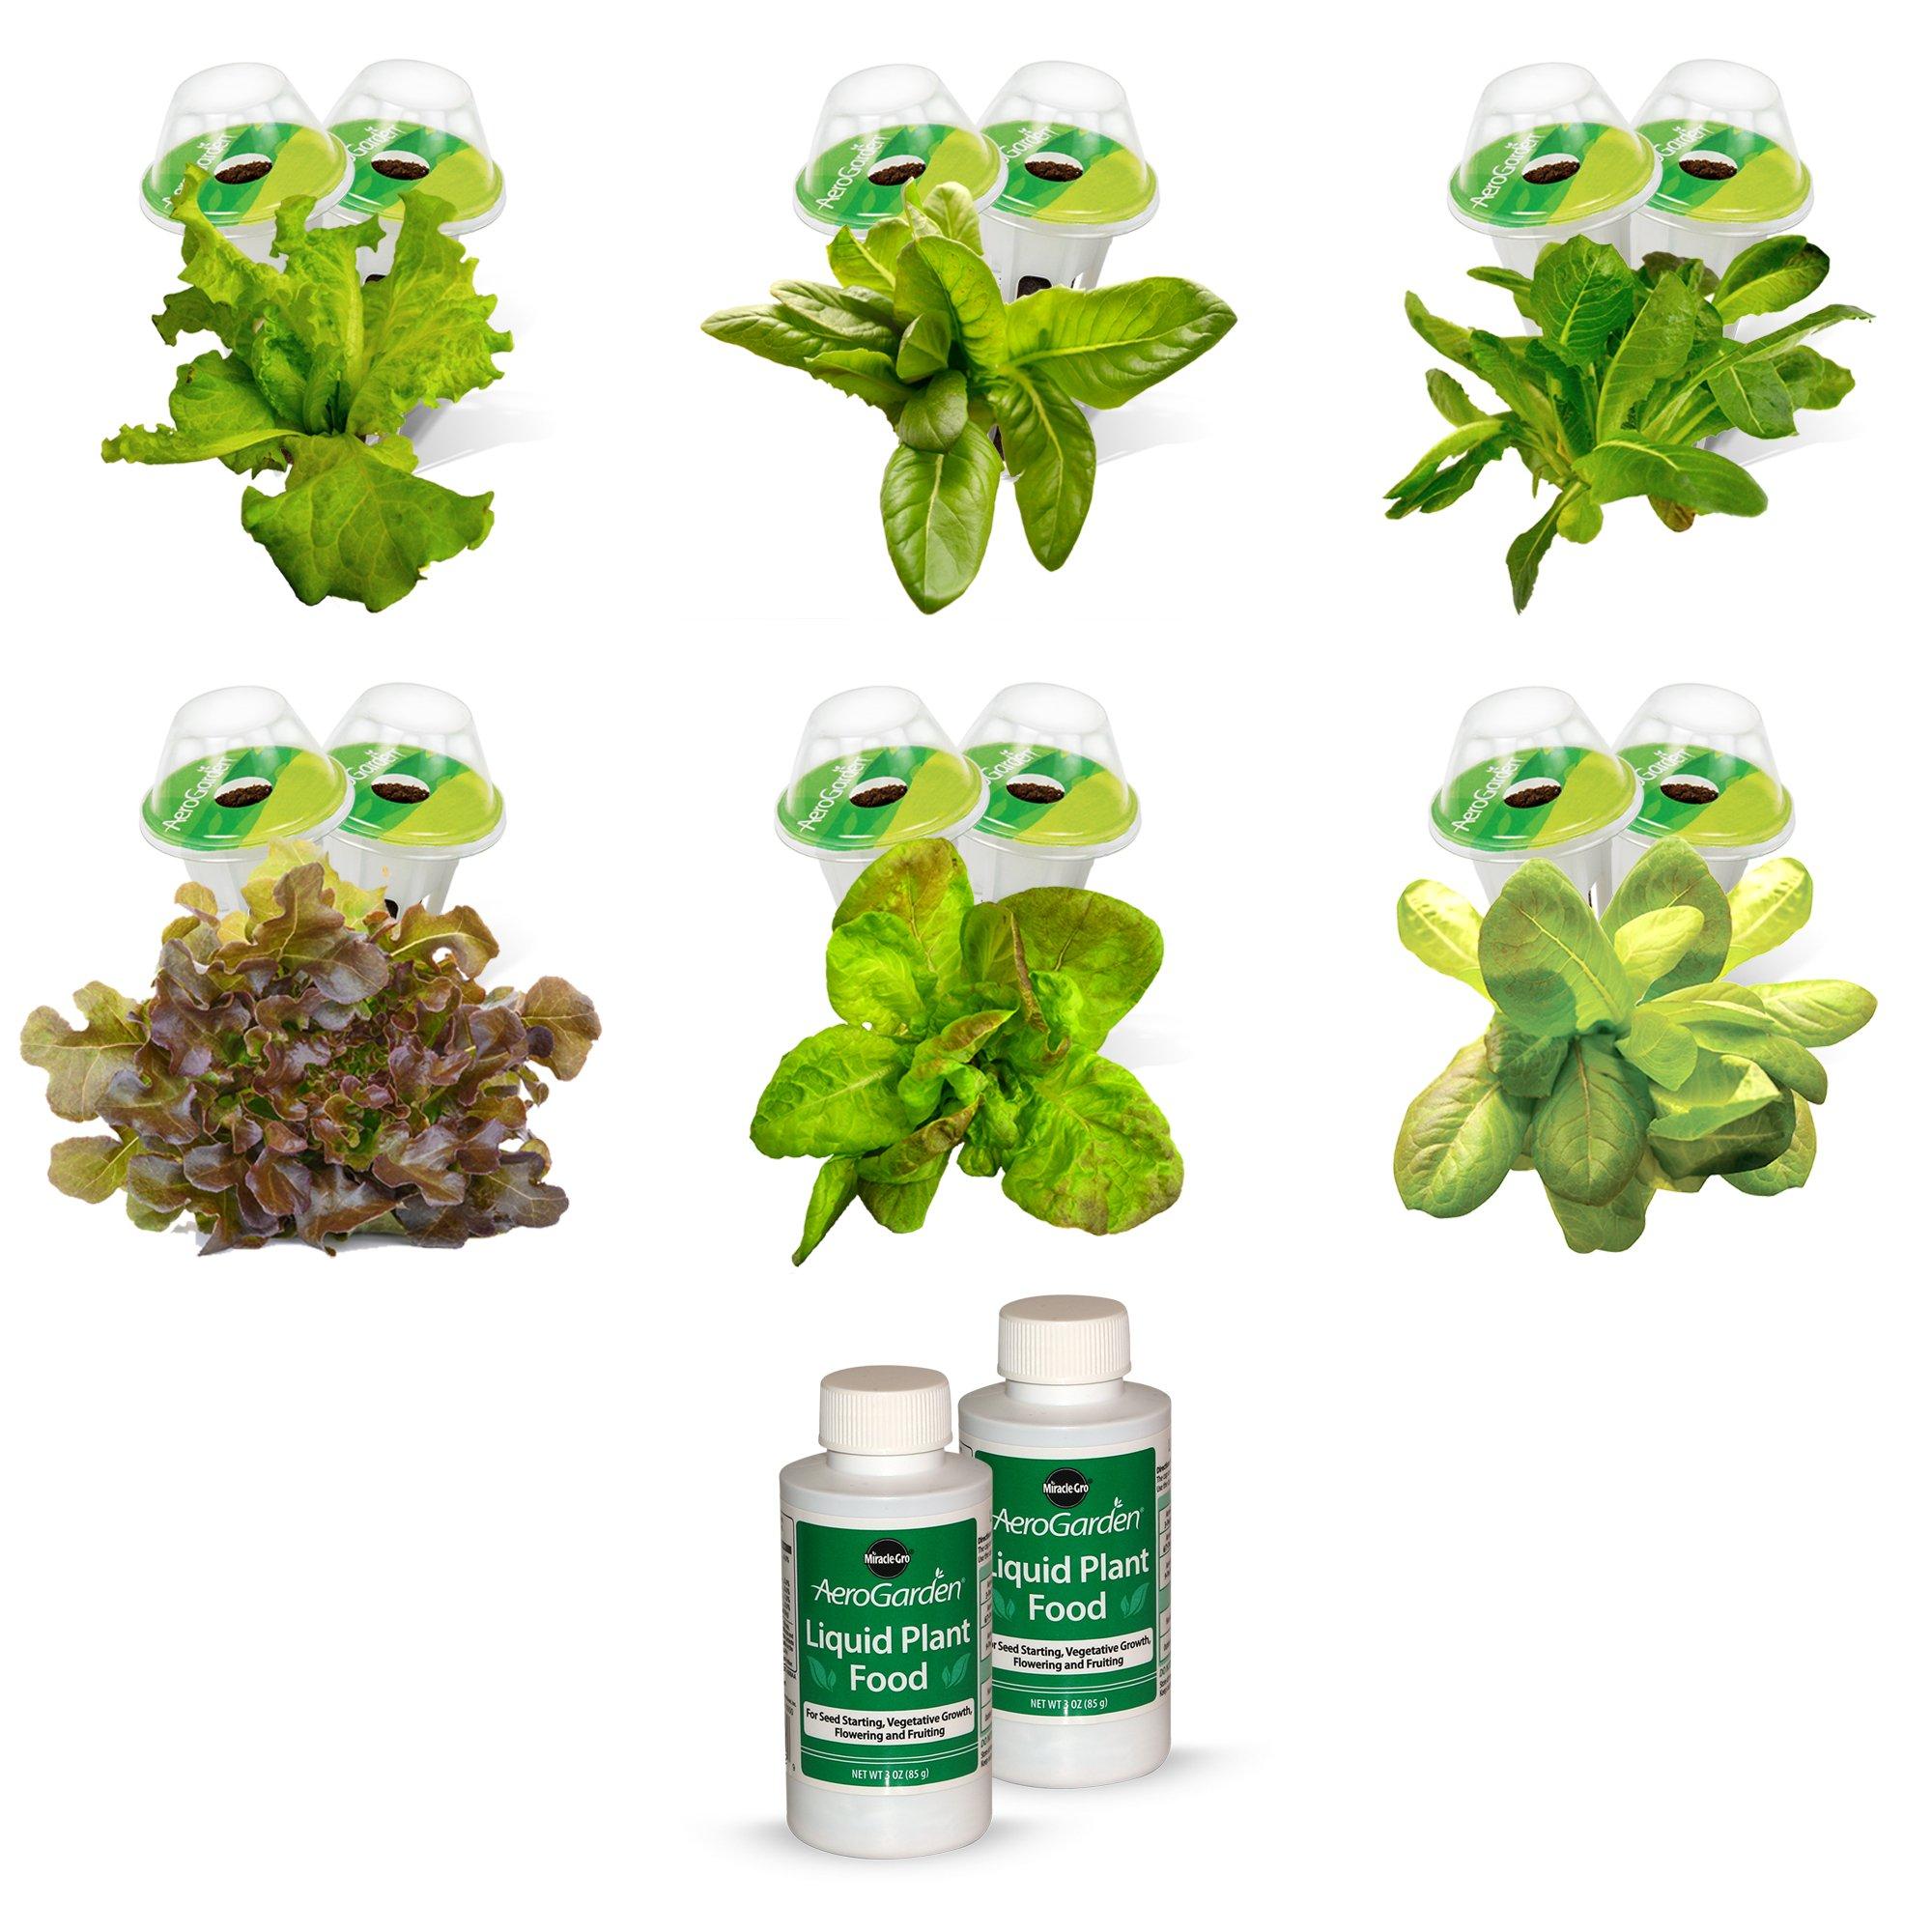 AeroGarden Heirloom Salad Greens Seed Pod Kit (for Farm/Farm Plus Models)